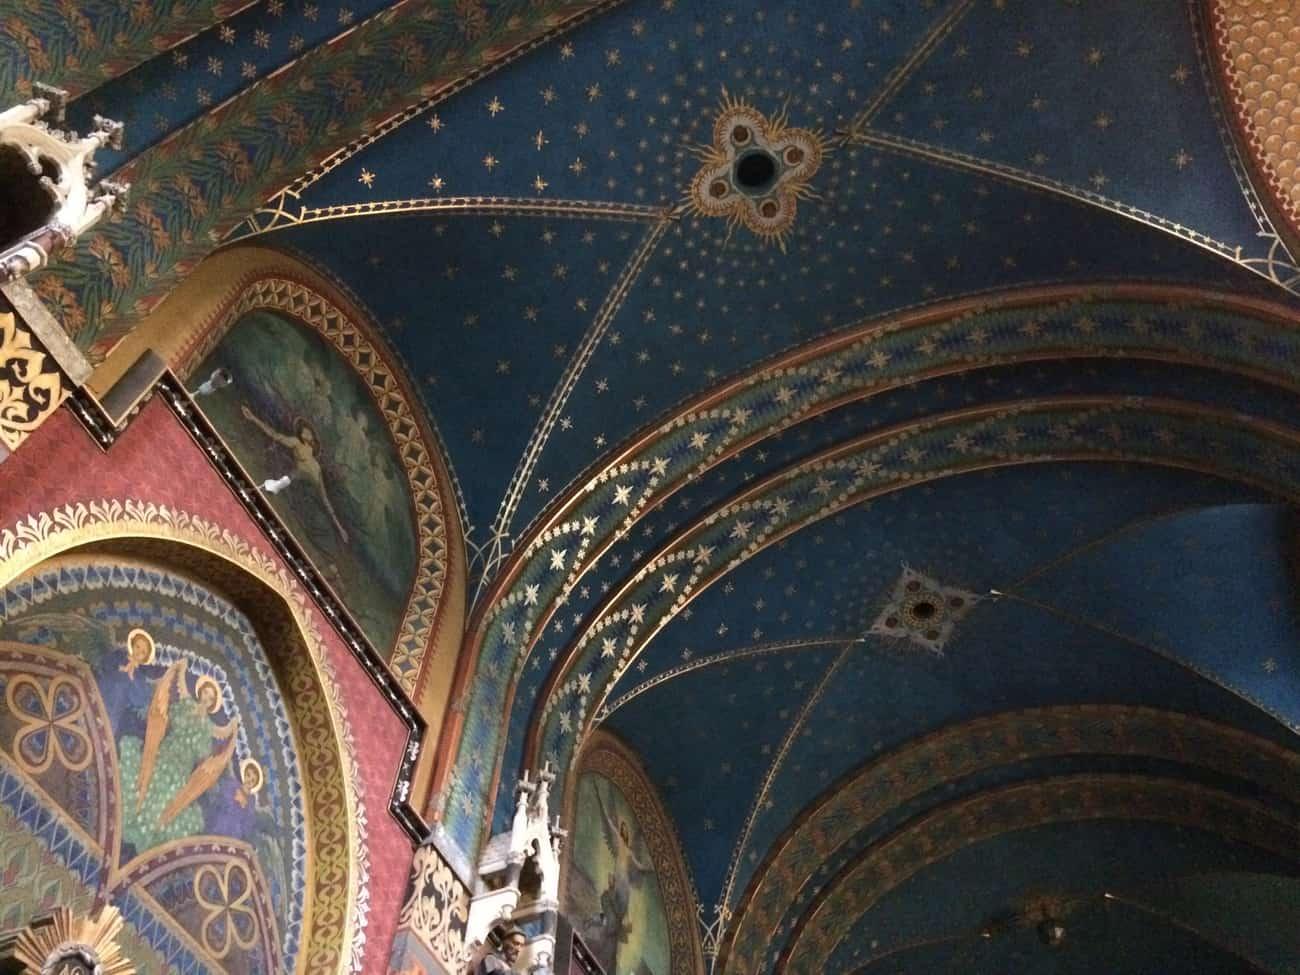 Poland Krakow Franciscan Church Interior Painted Ceiling